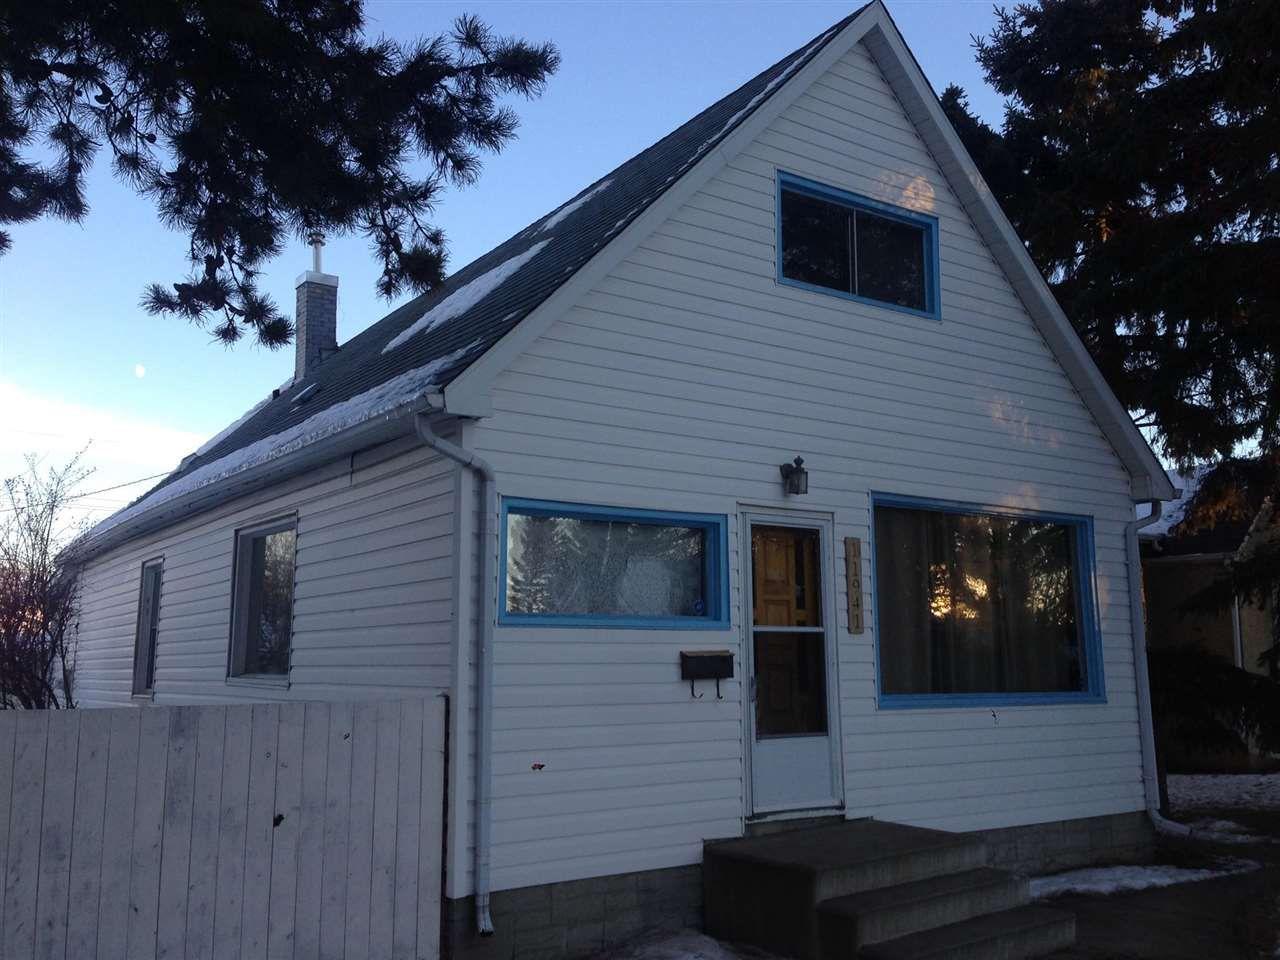 Main Photo: 11941 85 Street in Edmonton: Zone 05 House for sale : MLS®# E4138467